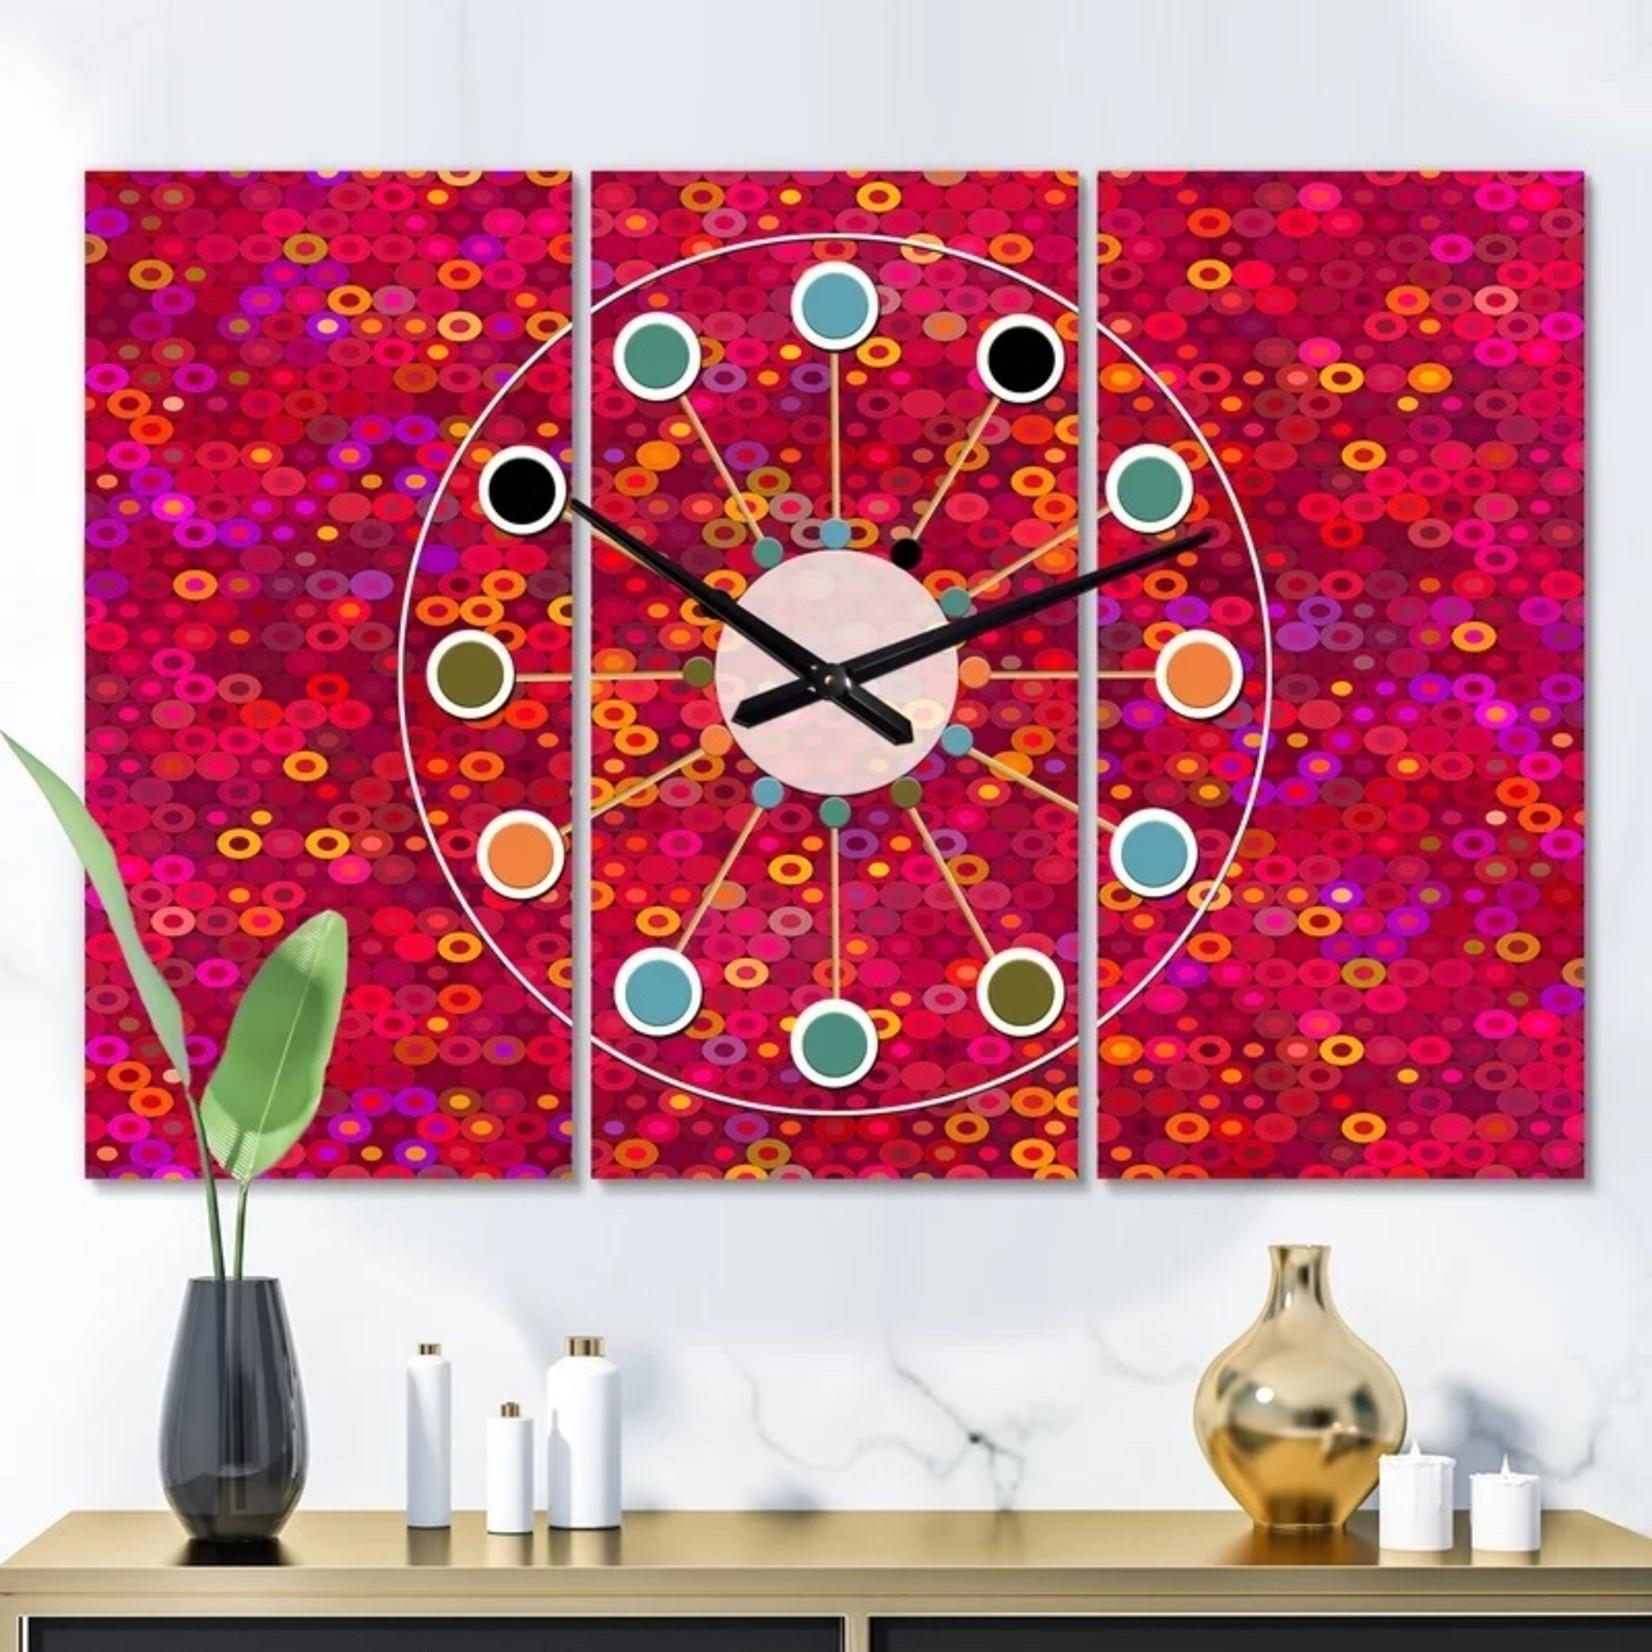 *Oversized Circular Retro III Mid-Century Wall Clock - 3 Piece